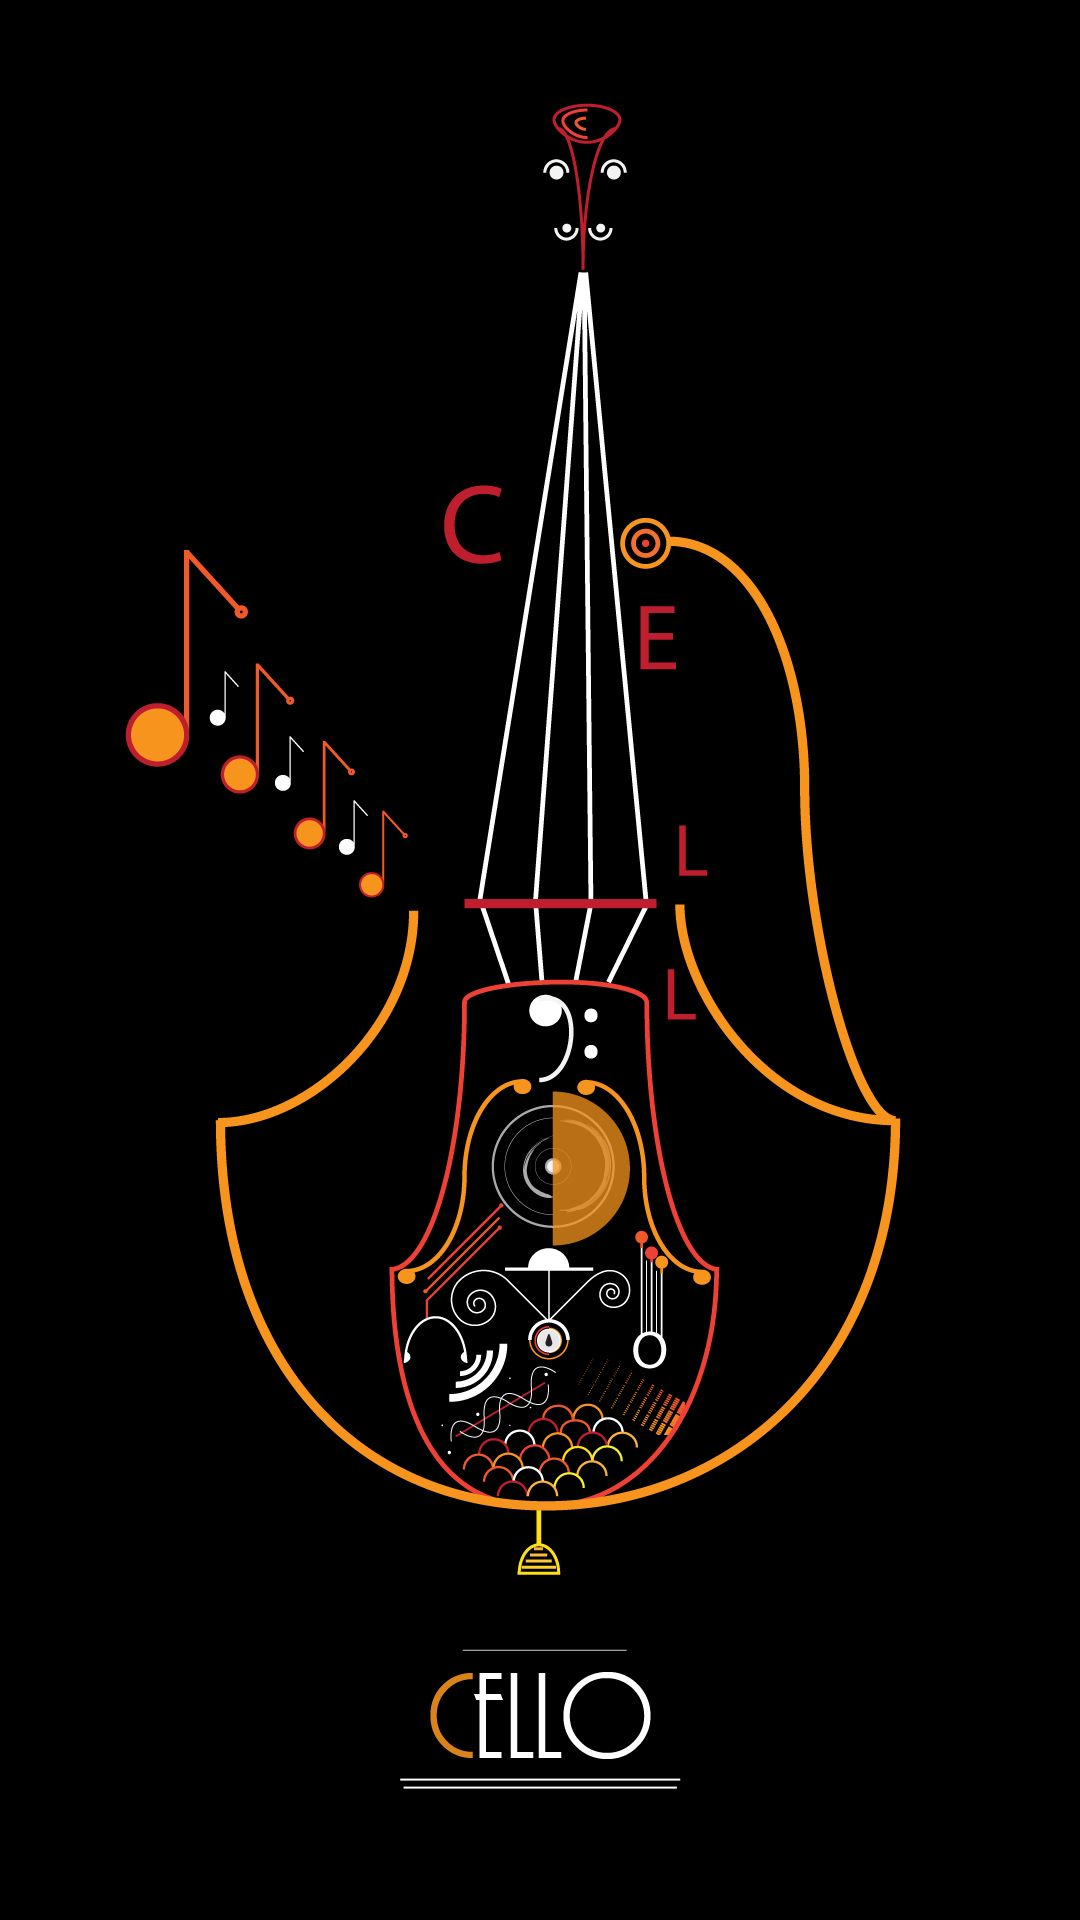 Vector Cello Classical Music Poster Cello Art Music Illustration